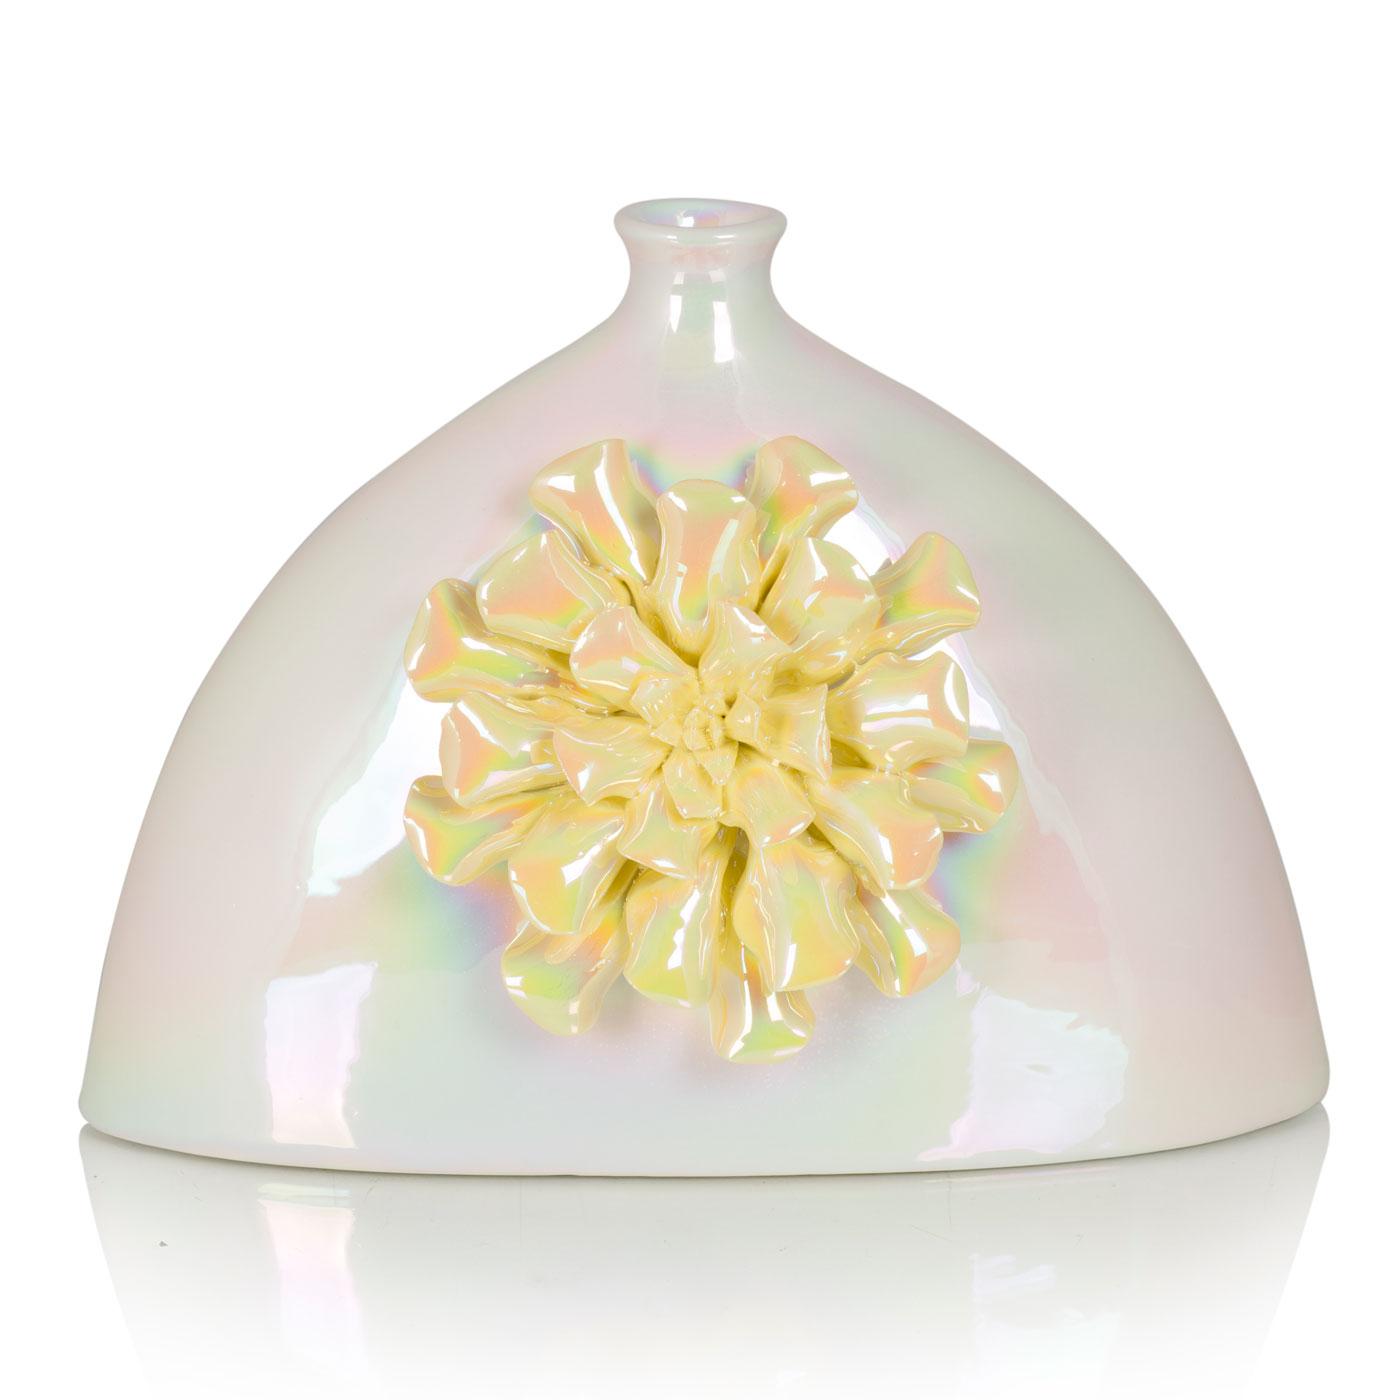 {} Home Philosophy Ваза Cindia Цвет: Перламутровый-Желтый (10х19х27 см) ваза сияние цвет желтый 51 см 1984744